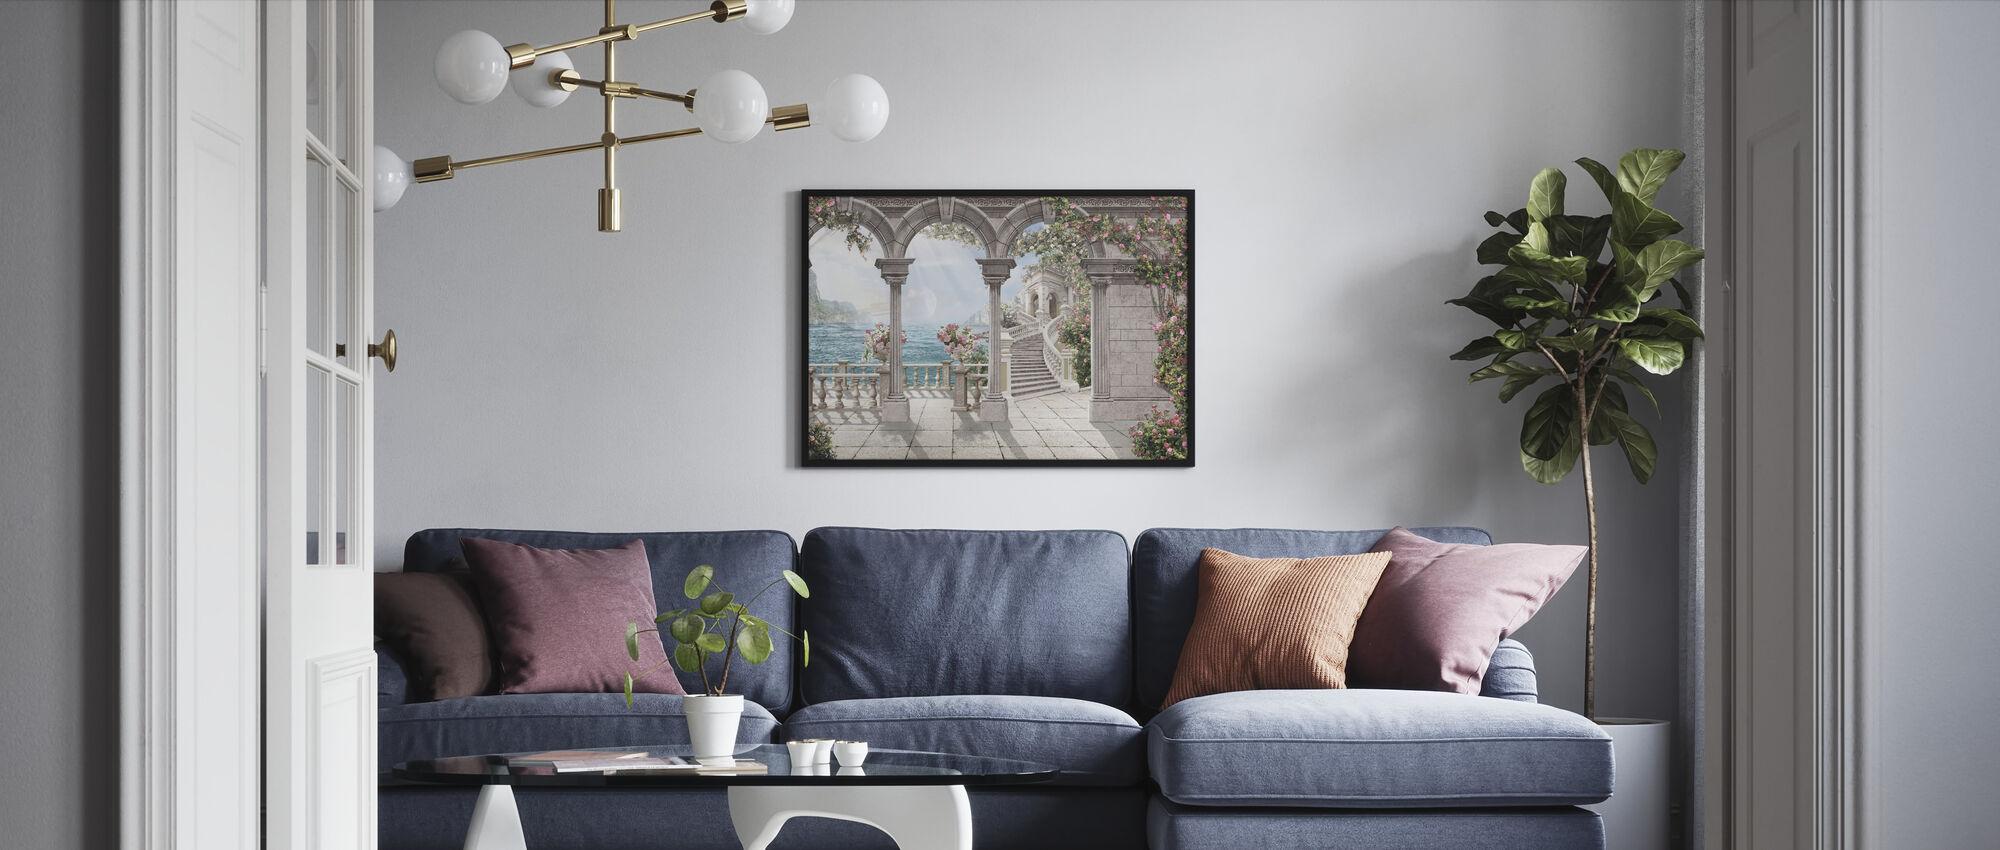 Antique Patio - Framed print - Living Room